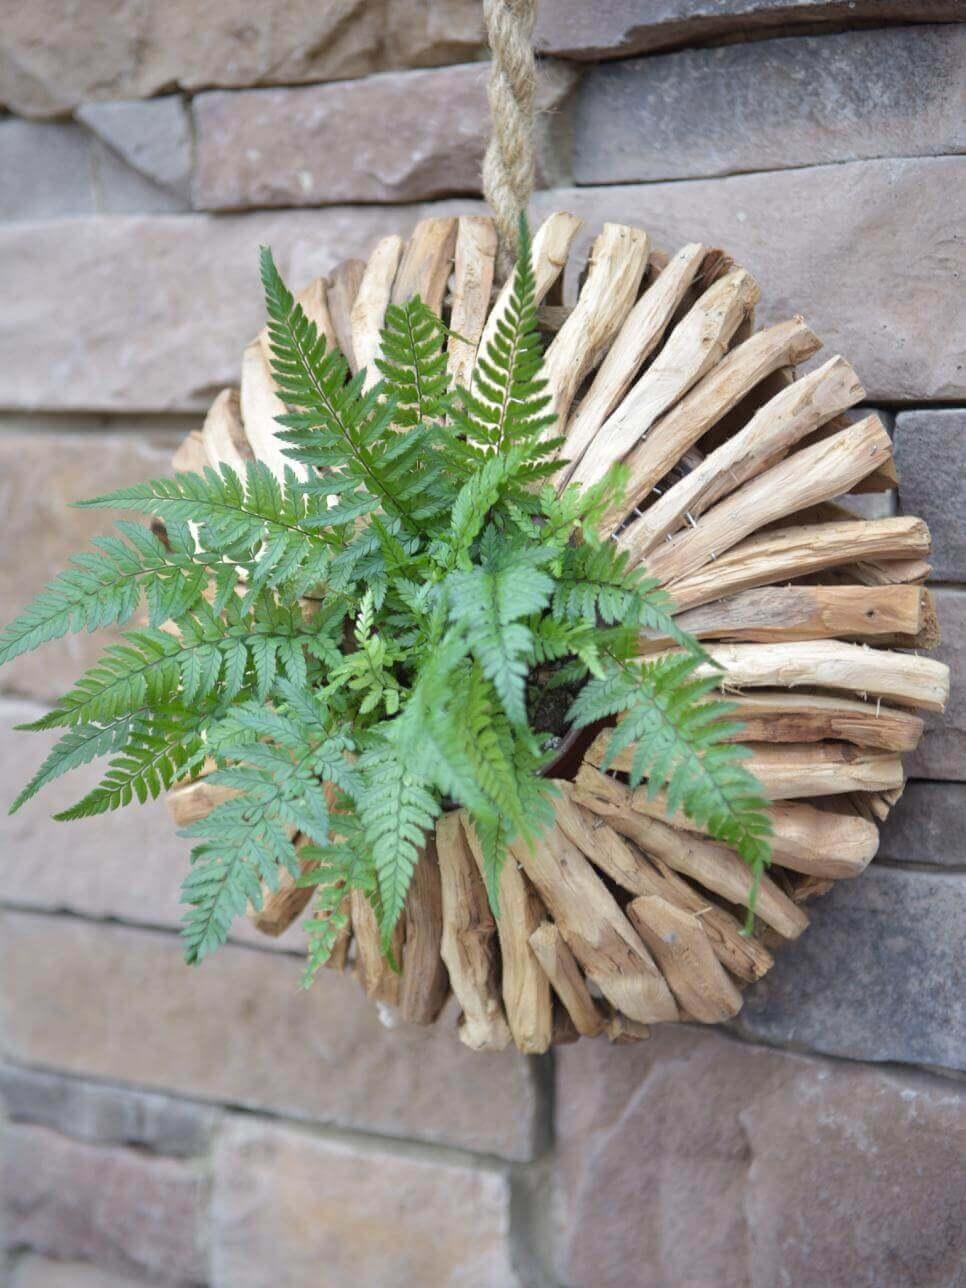 Striking Circular Wooden Fern Planter